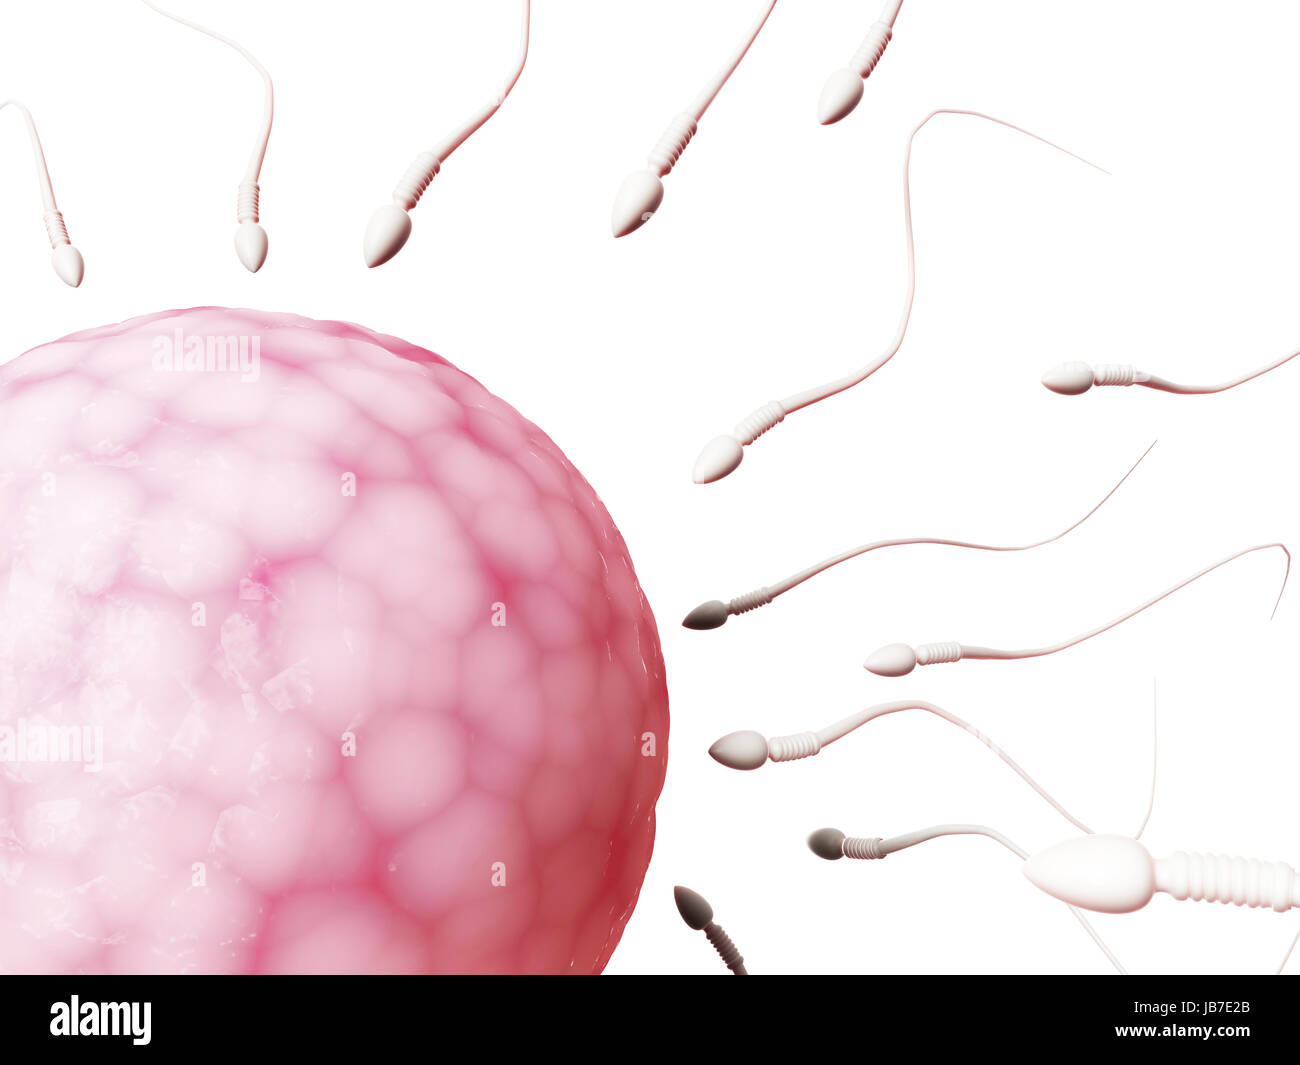 Girls laptop and sperm depletion criying when sex